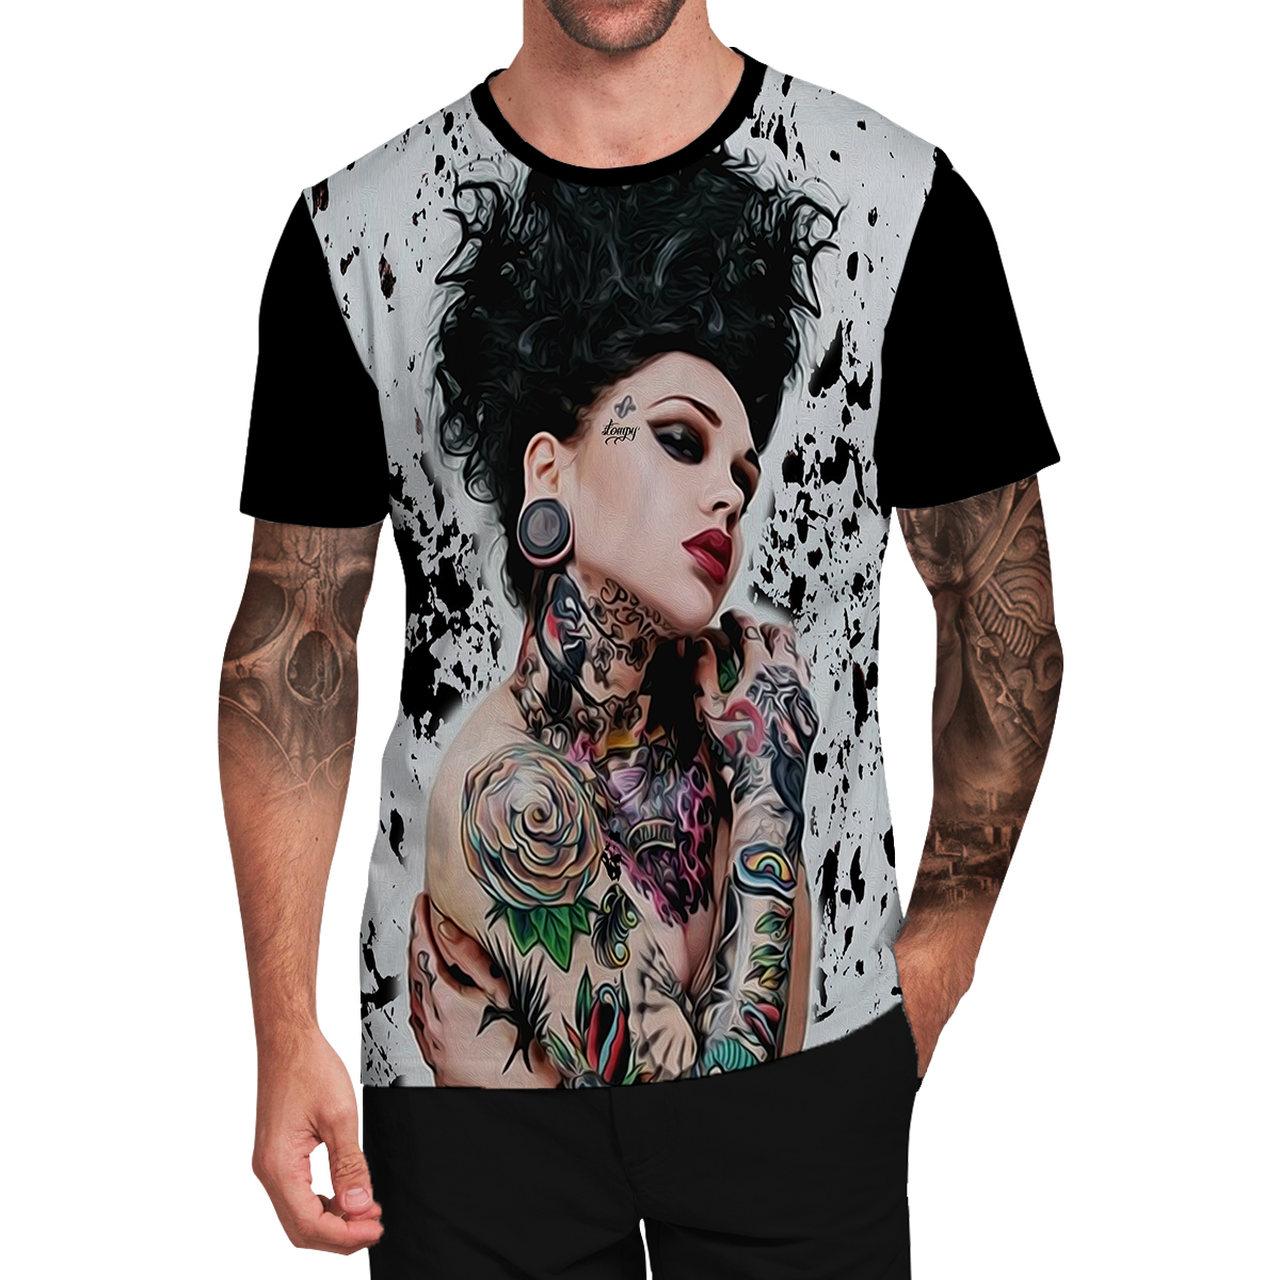 Stompy Camiseta Tattoo Tatuagem Caveira Skull 64